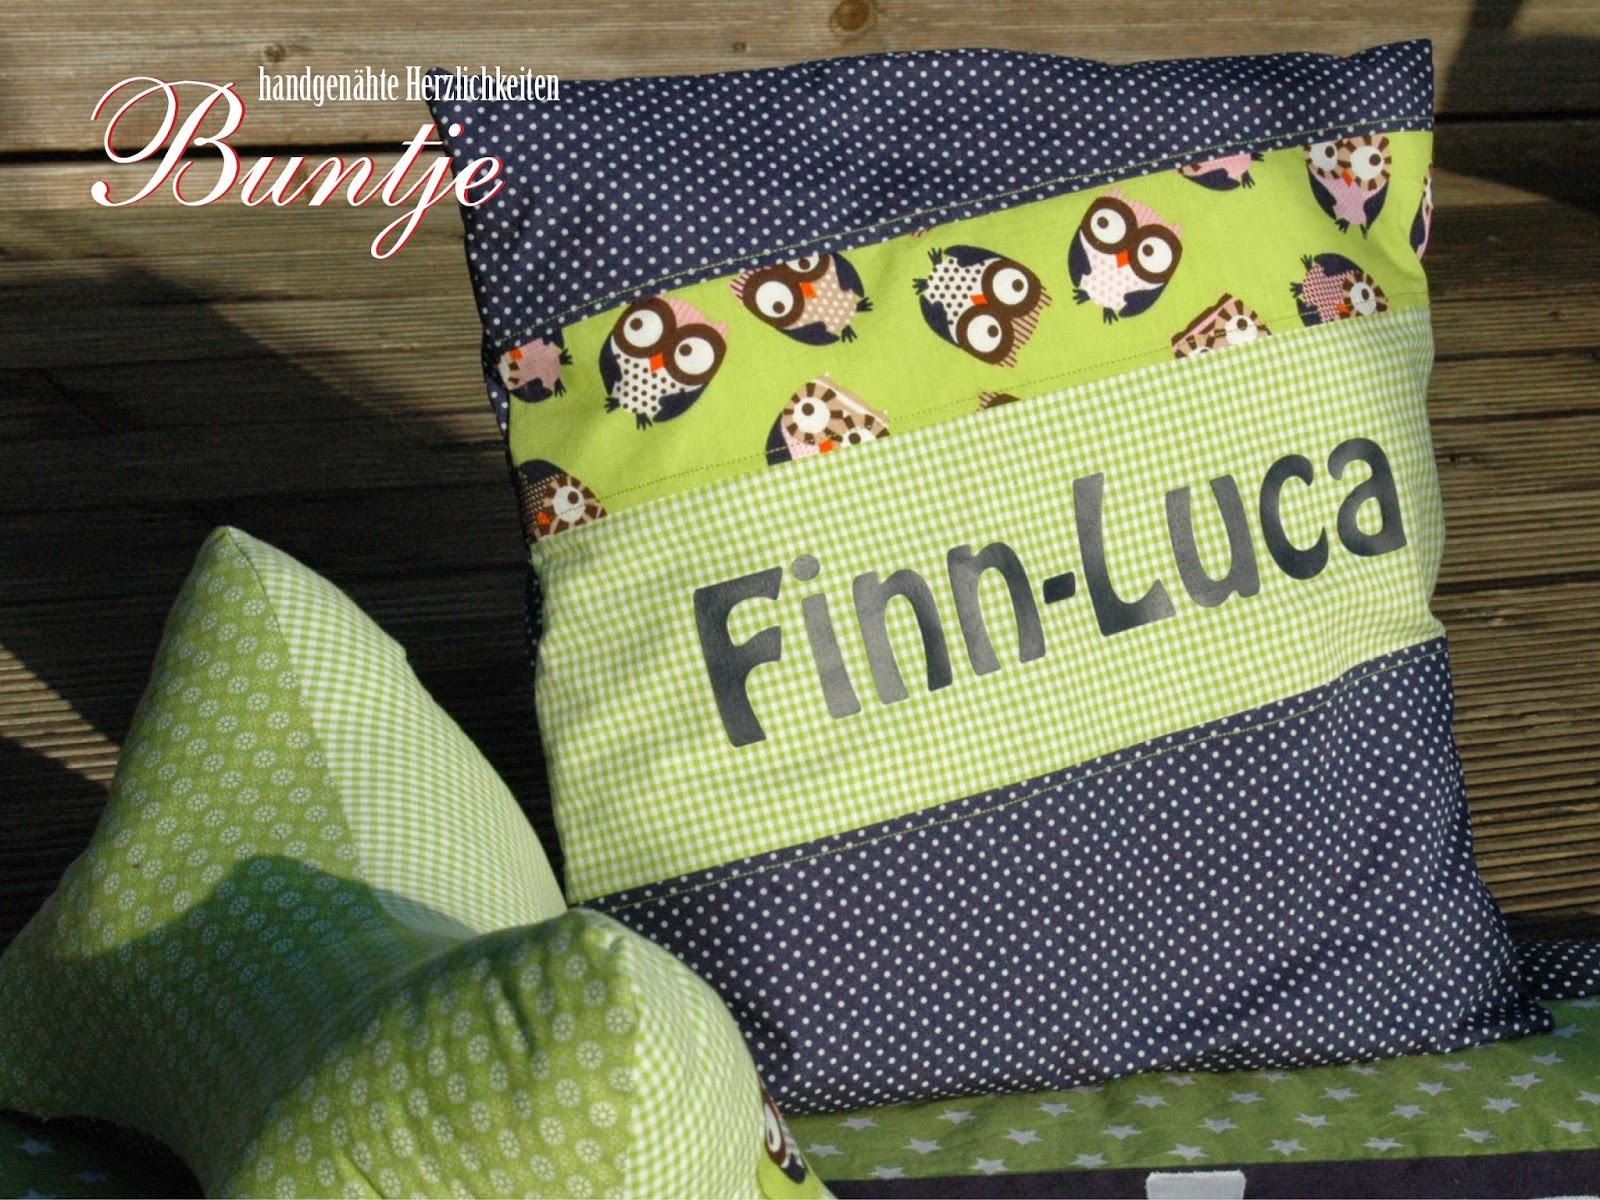 Namenskissen Kissen Name Geschenk Geburt Taufe Geburtstag Junge blau grün Eulen Tiere Finn Luca Buntje nähen handmade